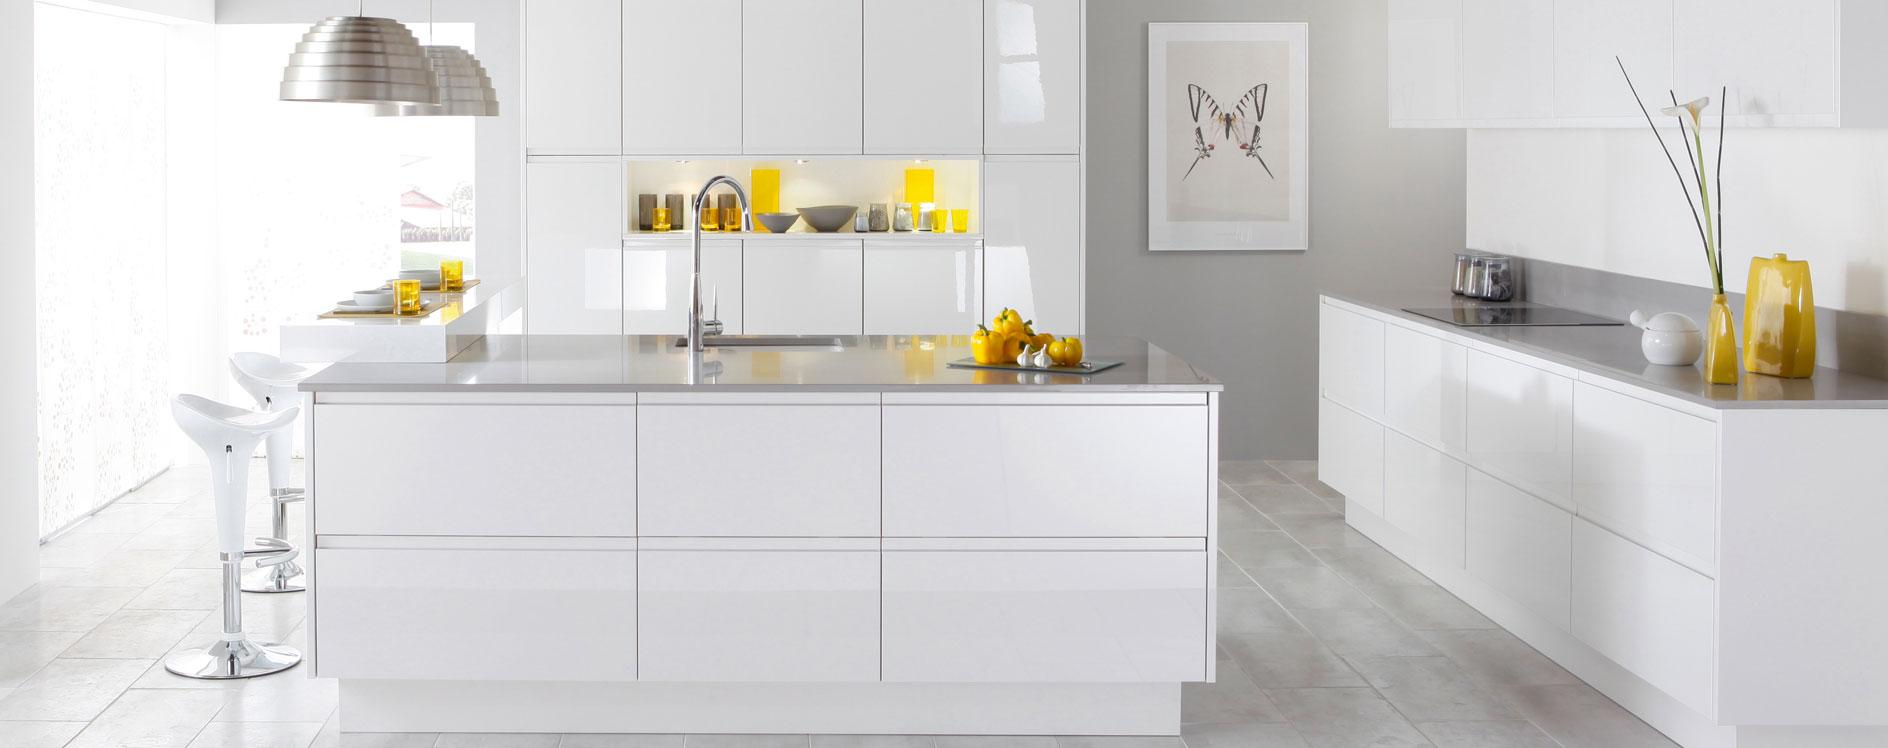 Malmo Painted Contemporary Kitchen  Martha Mockford